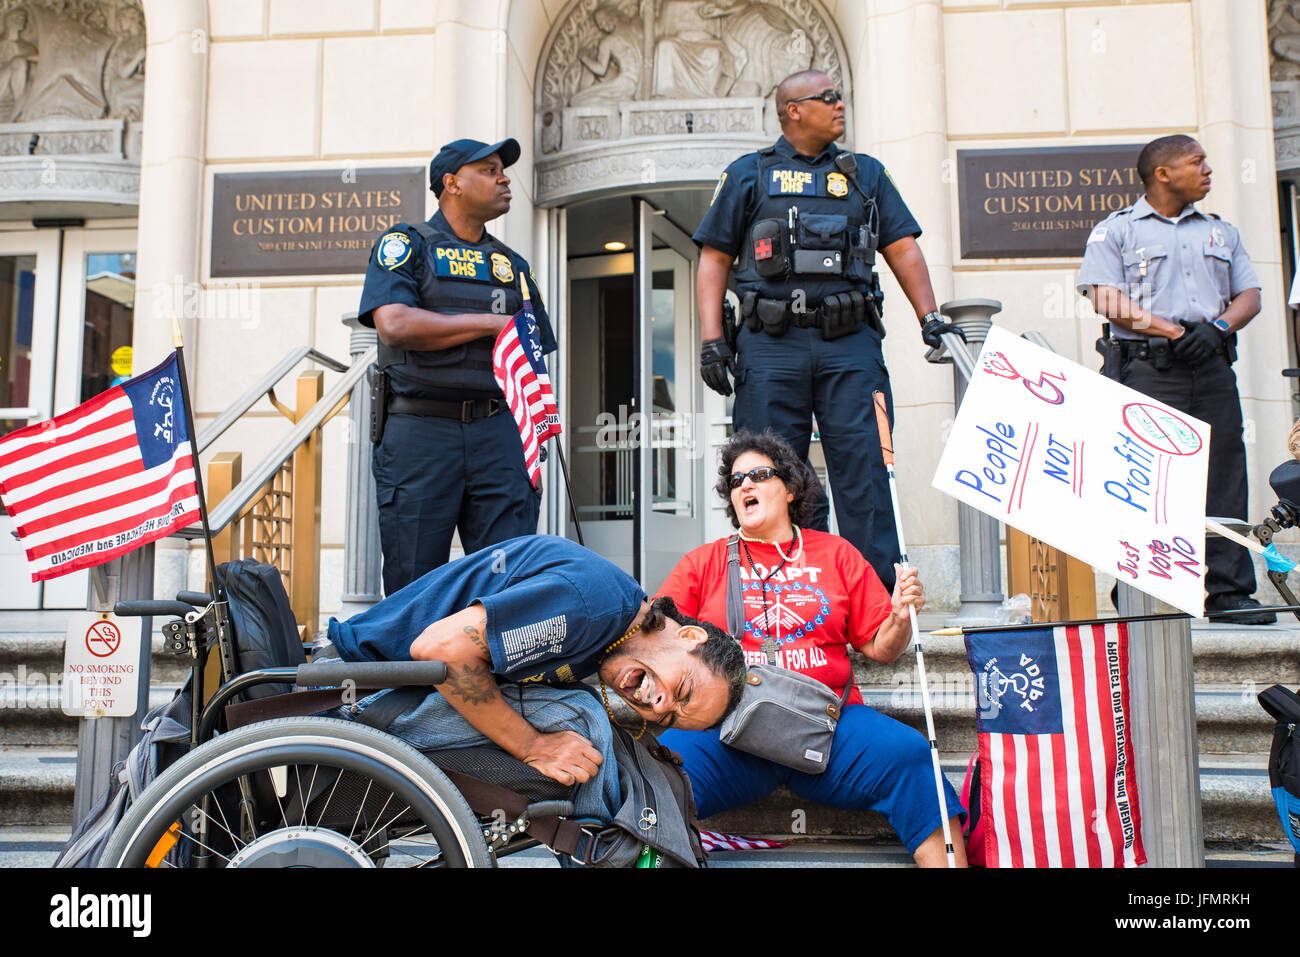 PA ADAPT member German Parodi blockades the entrance to the US Customs building where Senator Pat Toomey's office - Stock Image